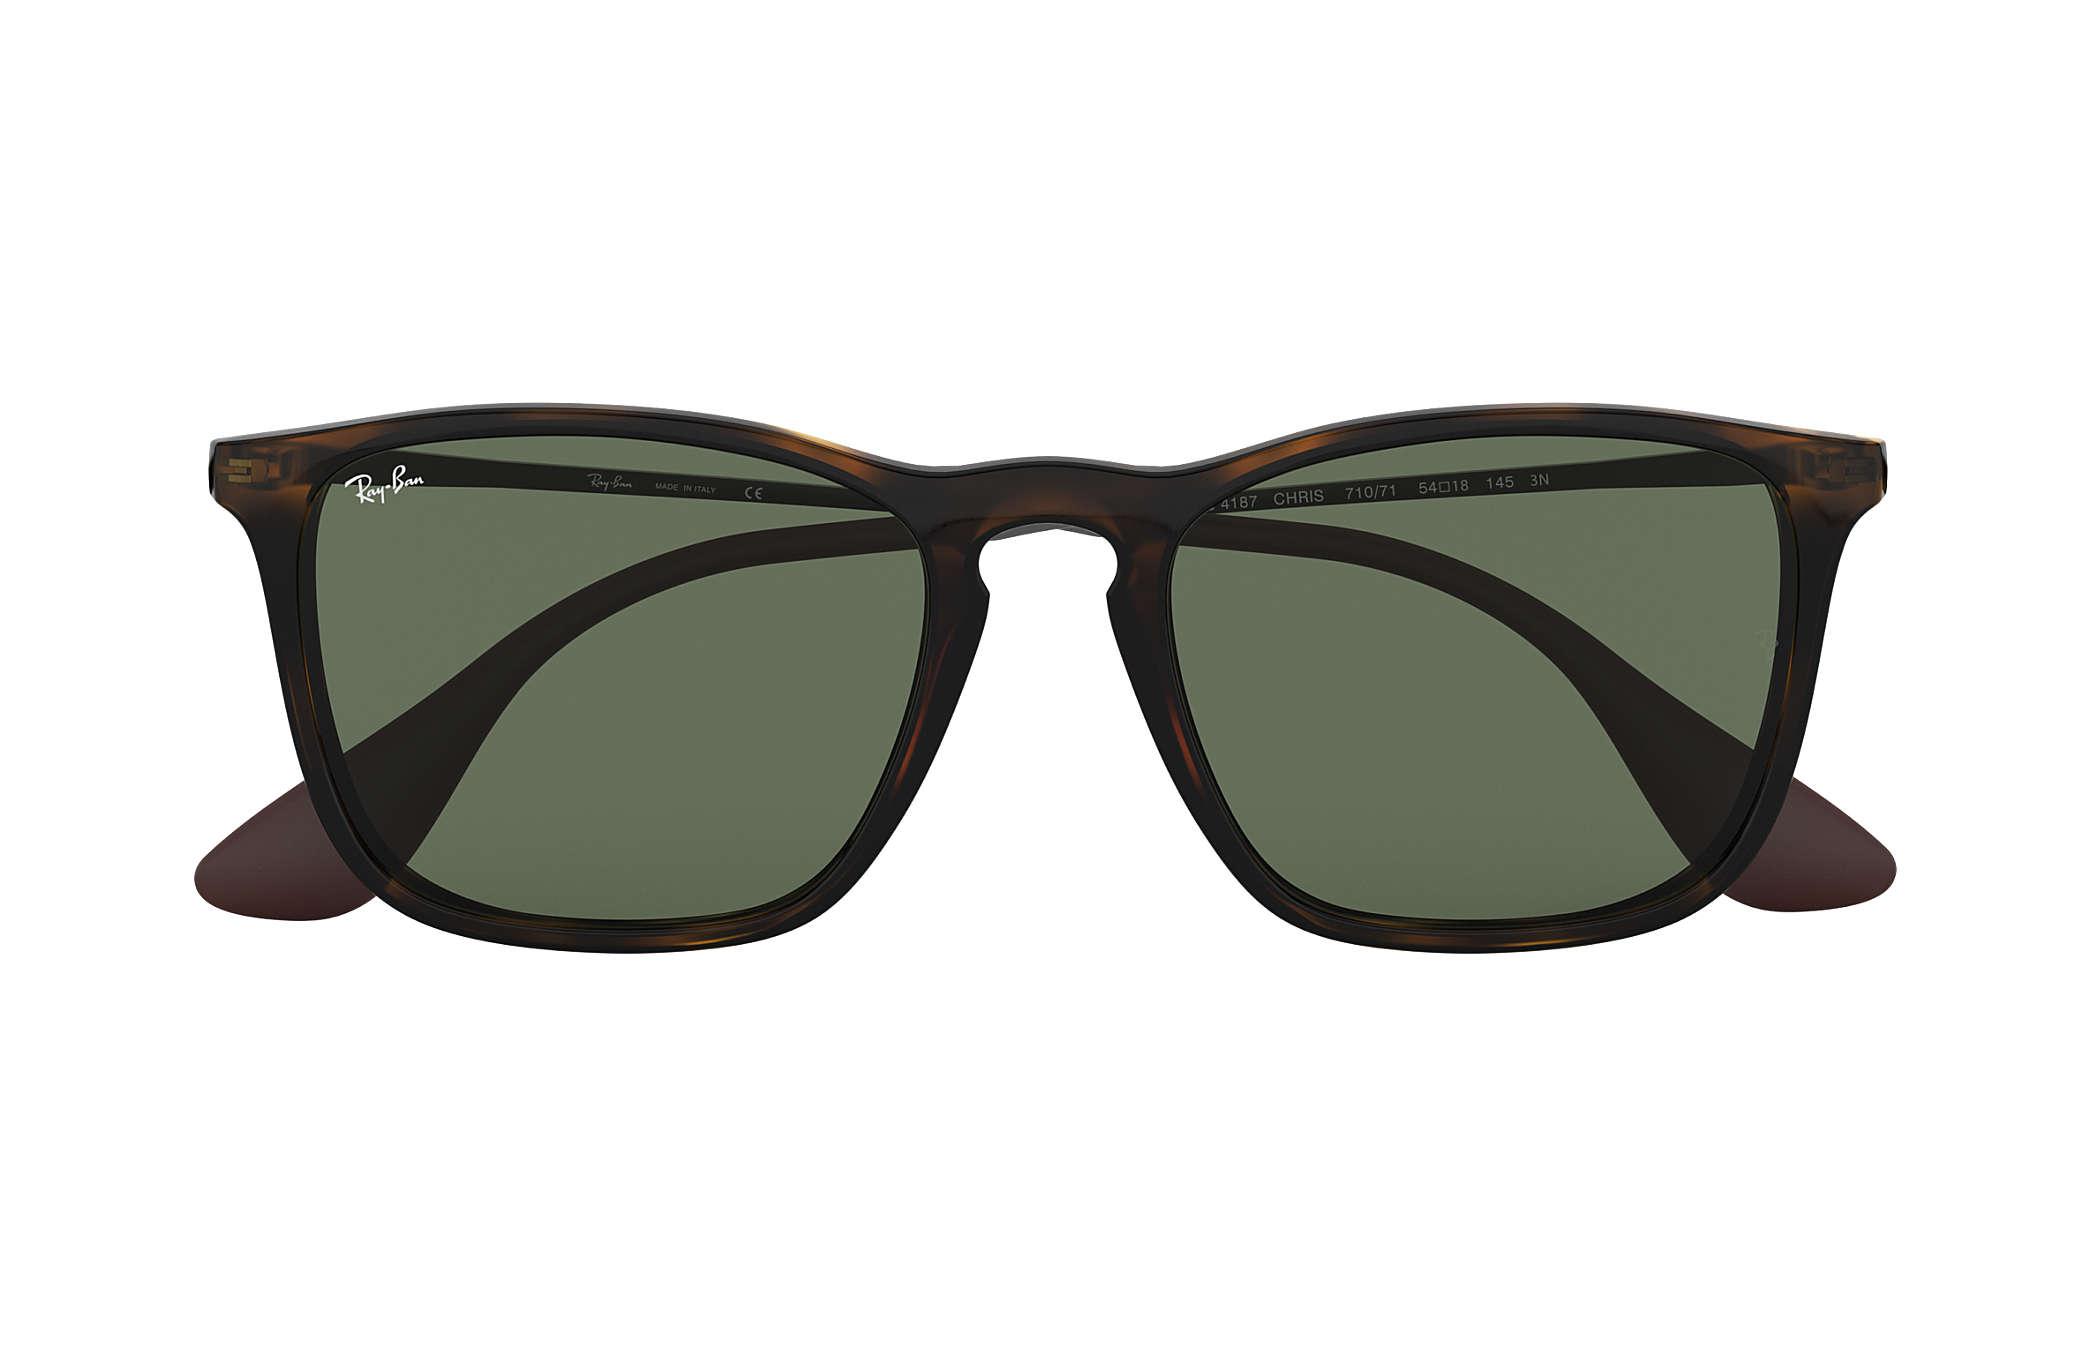 81a1ca24f8 Ray-Ban Chris RB4187 Tortoise - Nylon - Green Lenses - 0RB4187710 ...